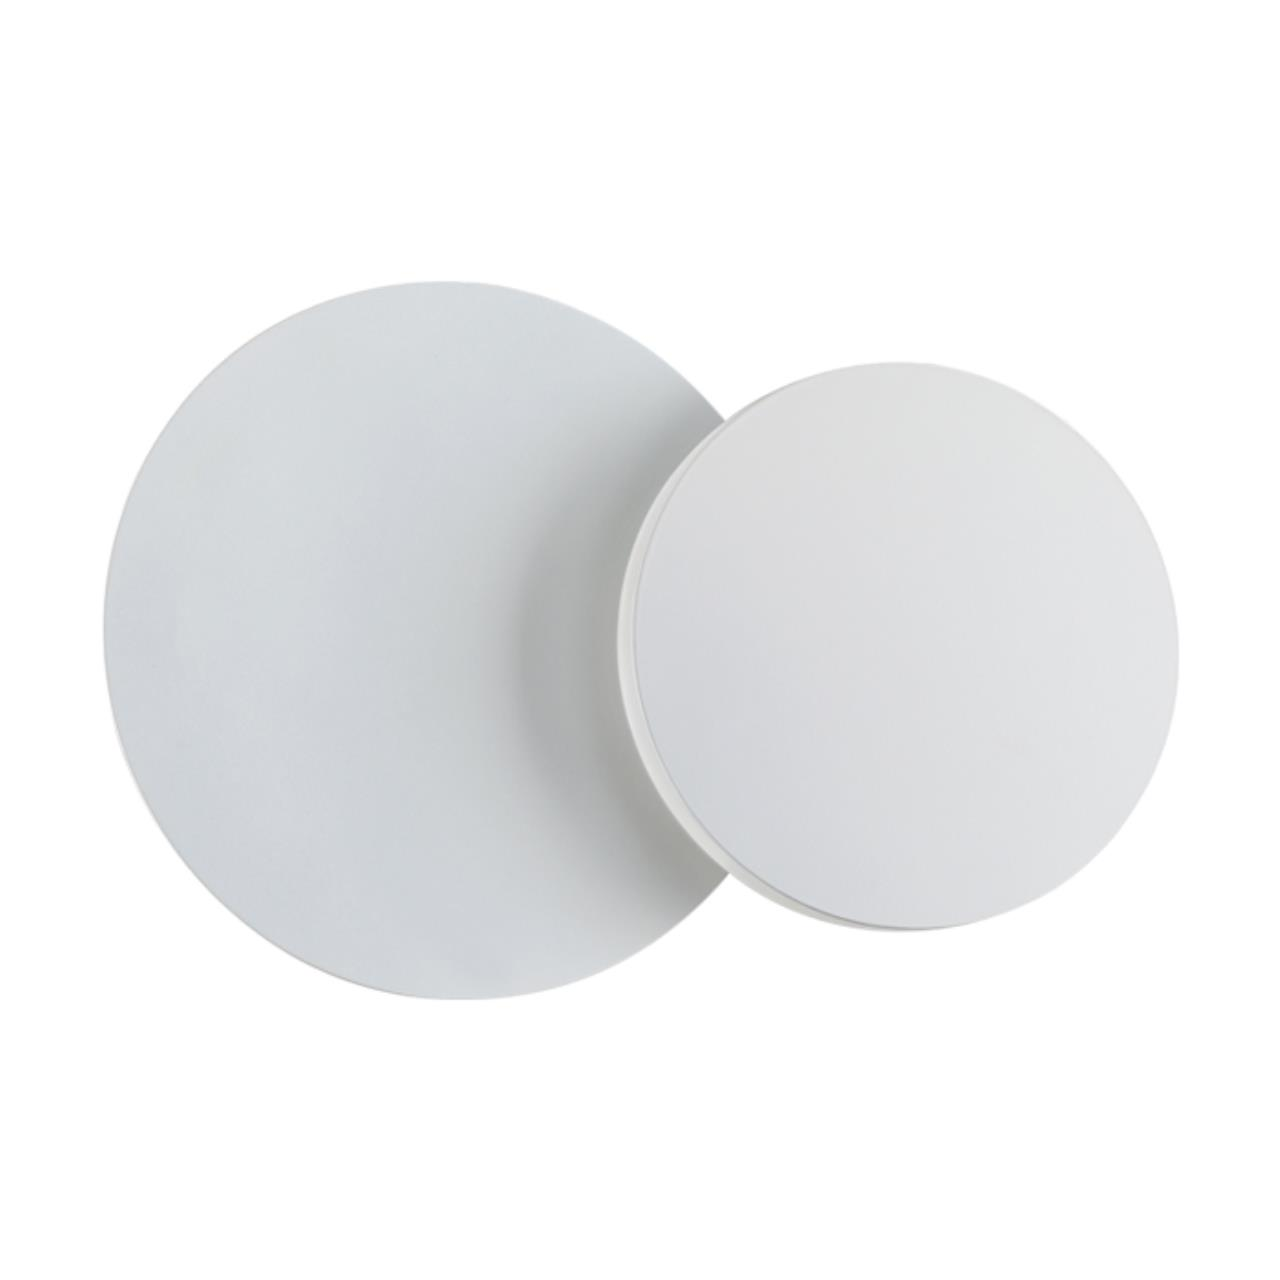 357856 OVER NT18 063 белый Накладной светильник IP20 LED 3000К 6W 110-240V SMENA